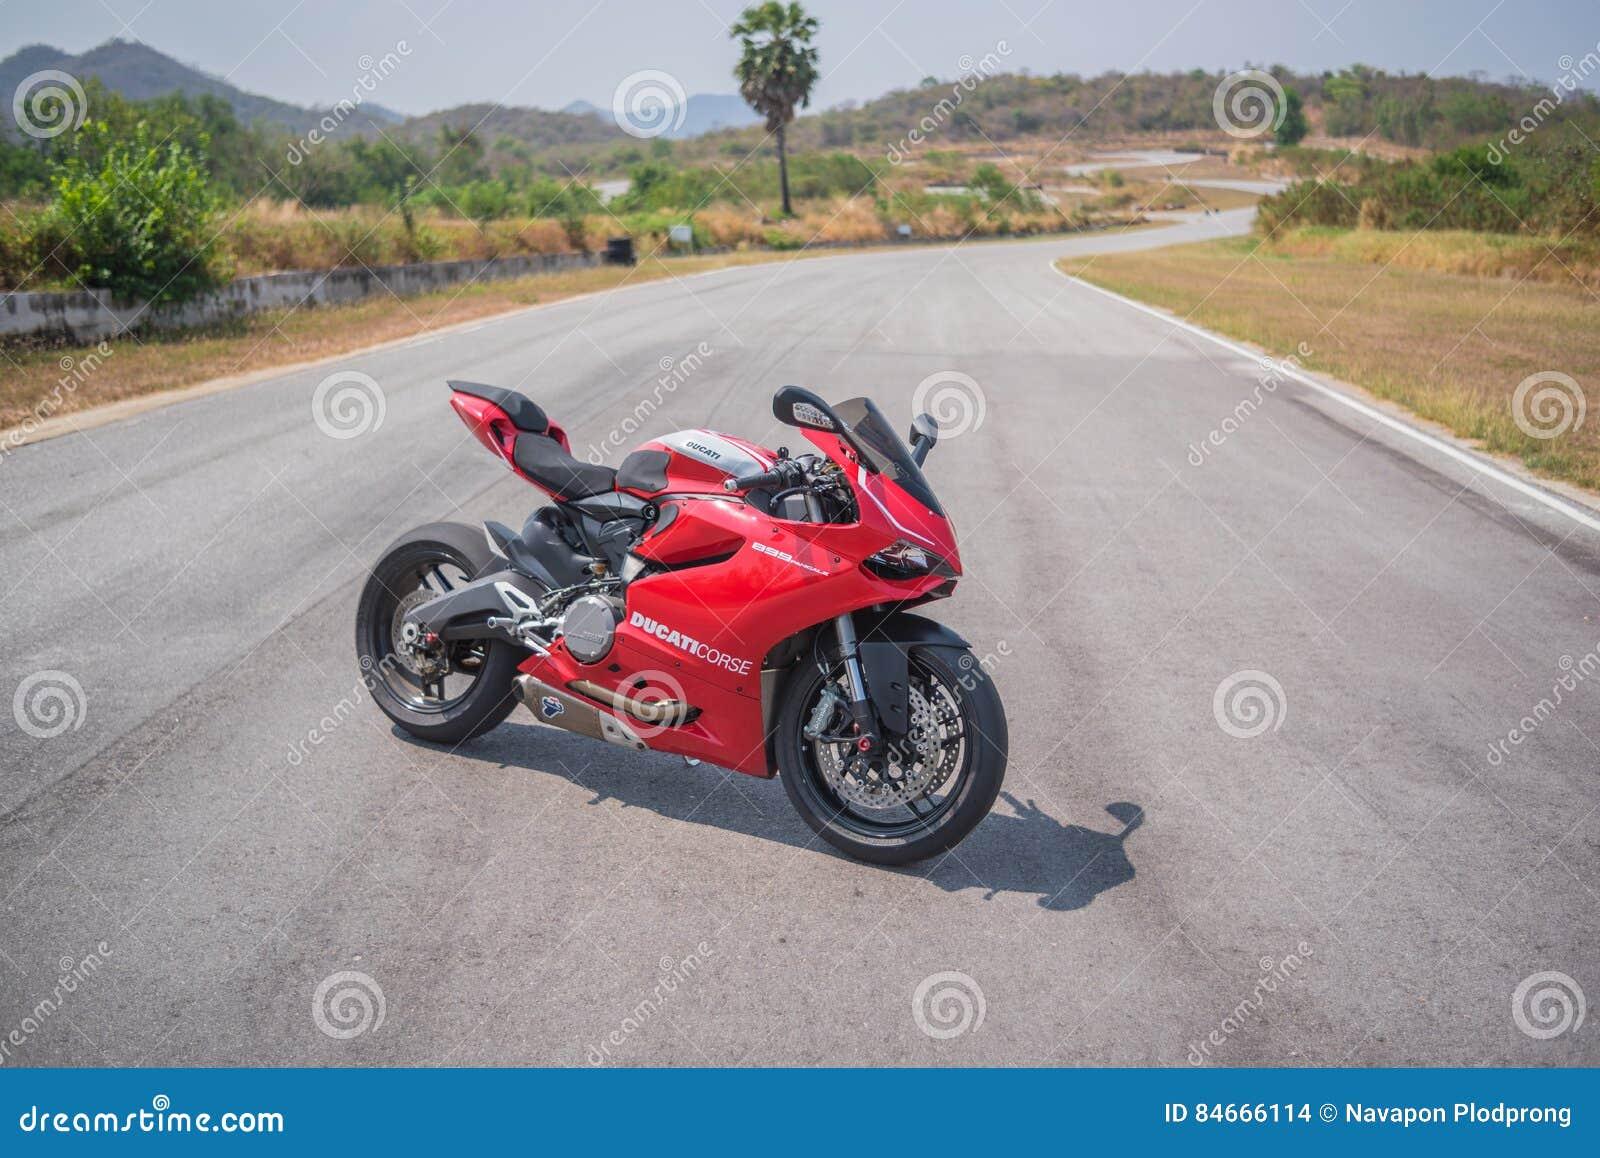 Ducati 899 Sport Bike By Ducati Motor Holding Editorial Stock Image